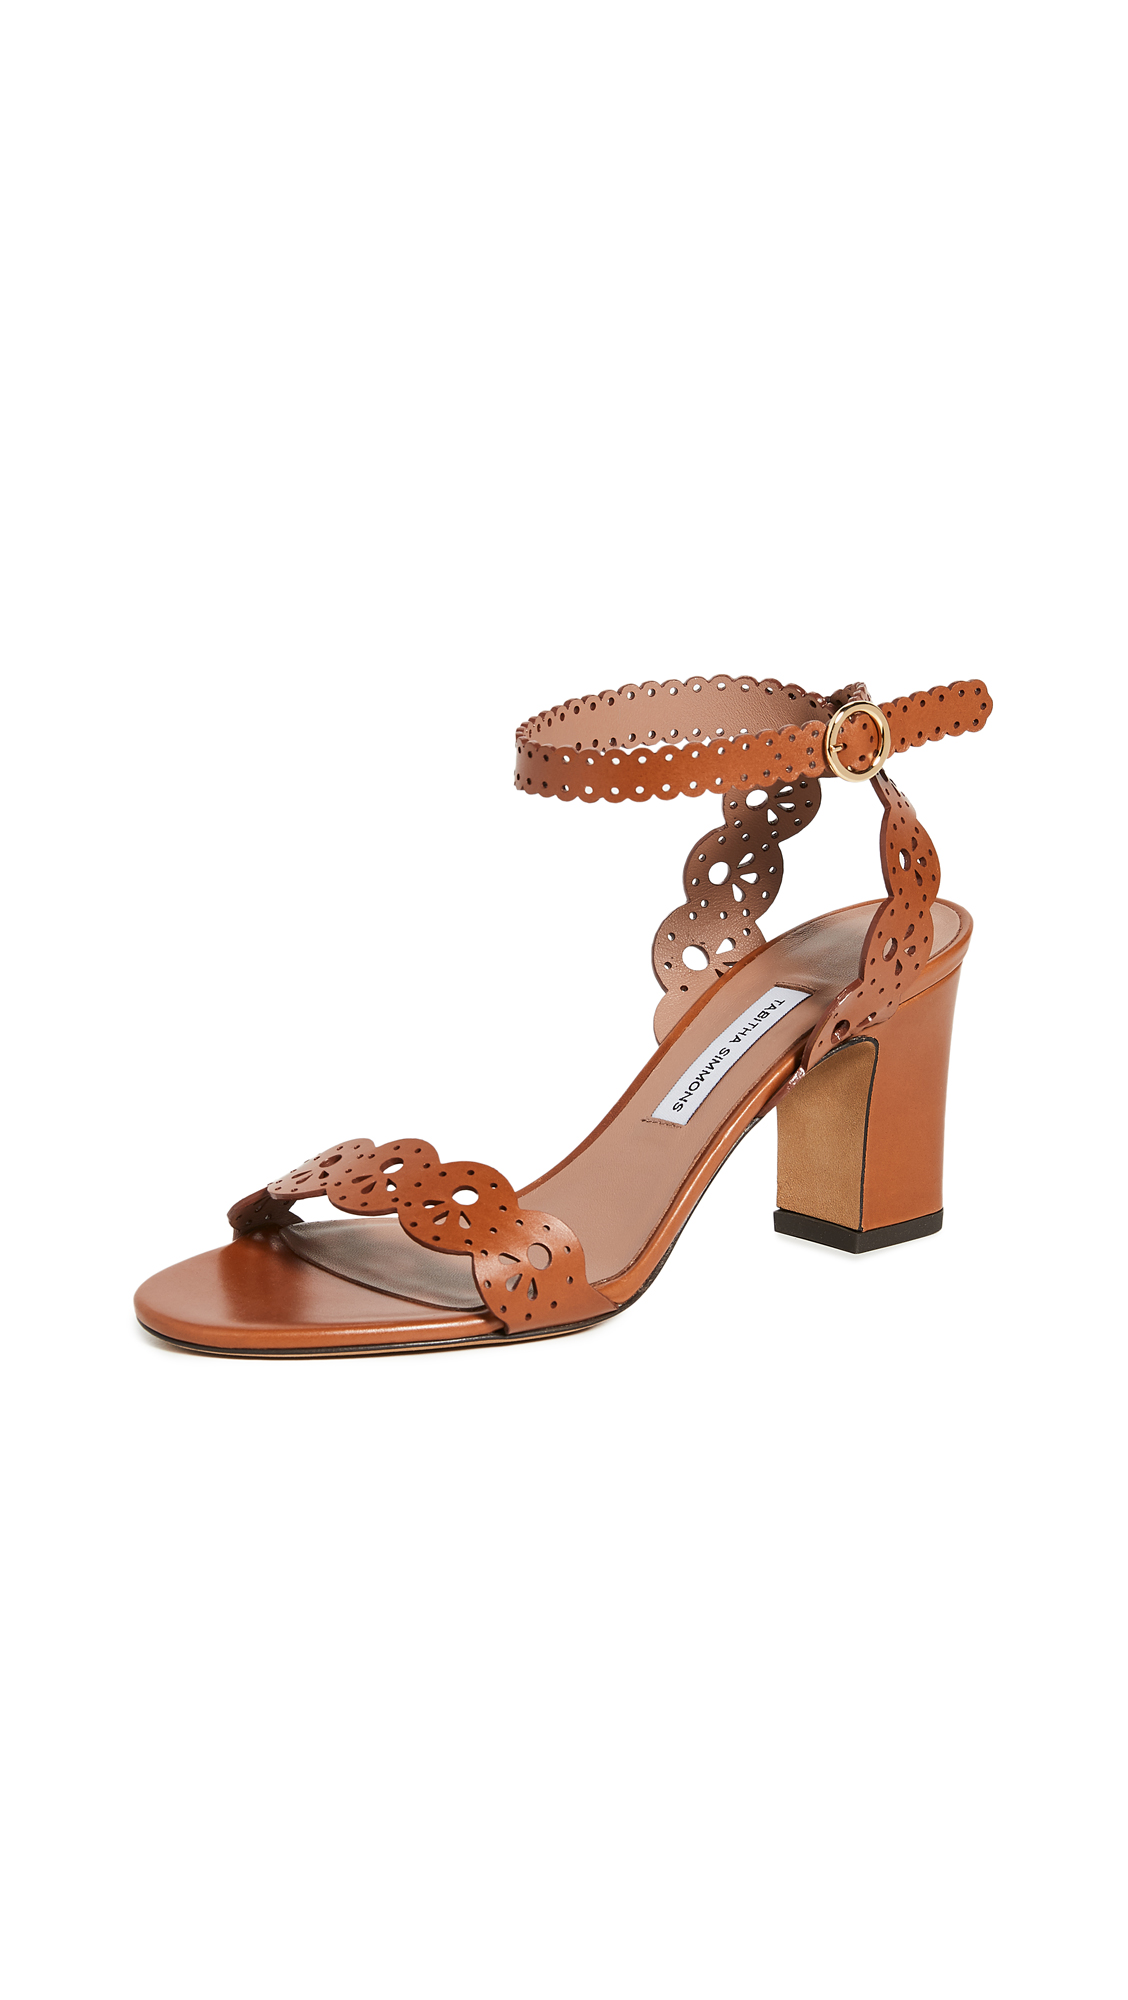 Buy Tabitha Simmons Bobbin Block Sandals online, shop Tabitha Simmons